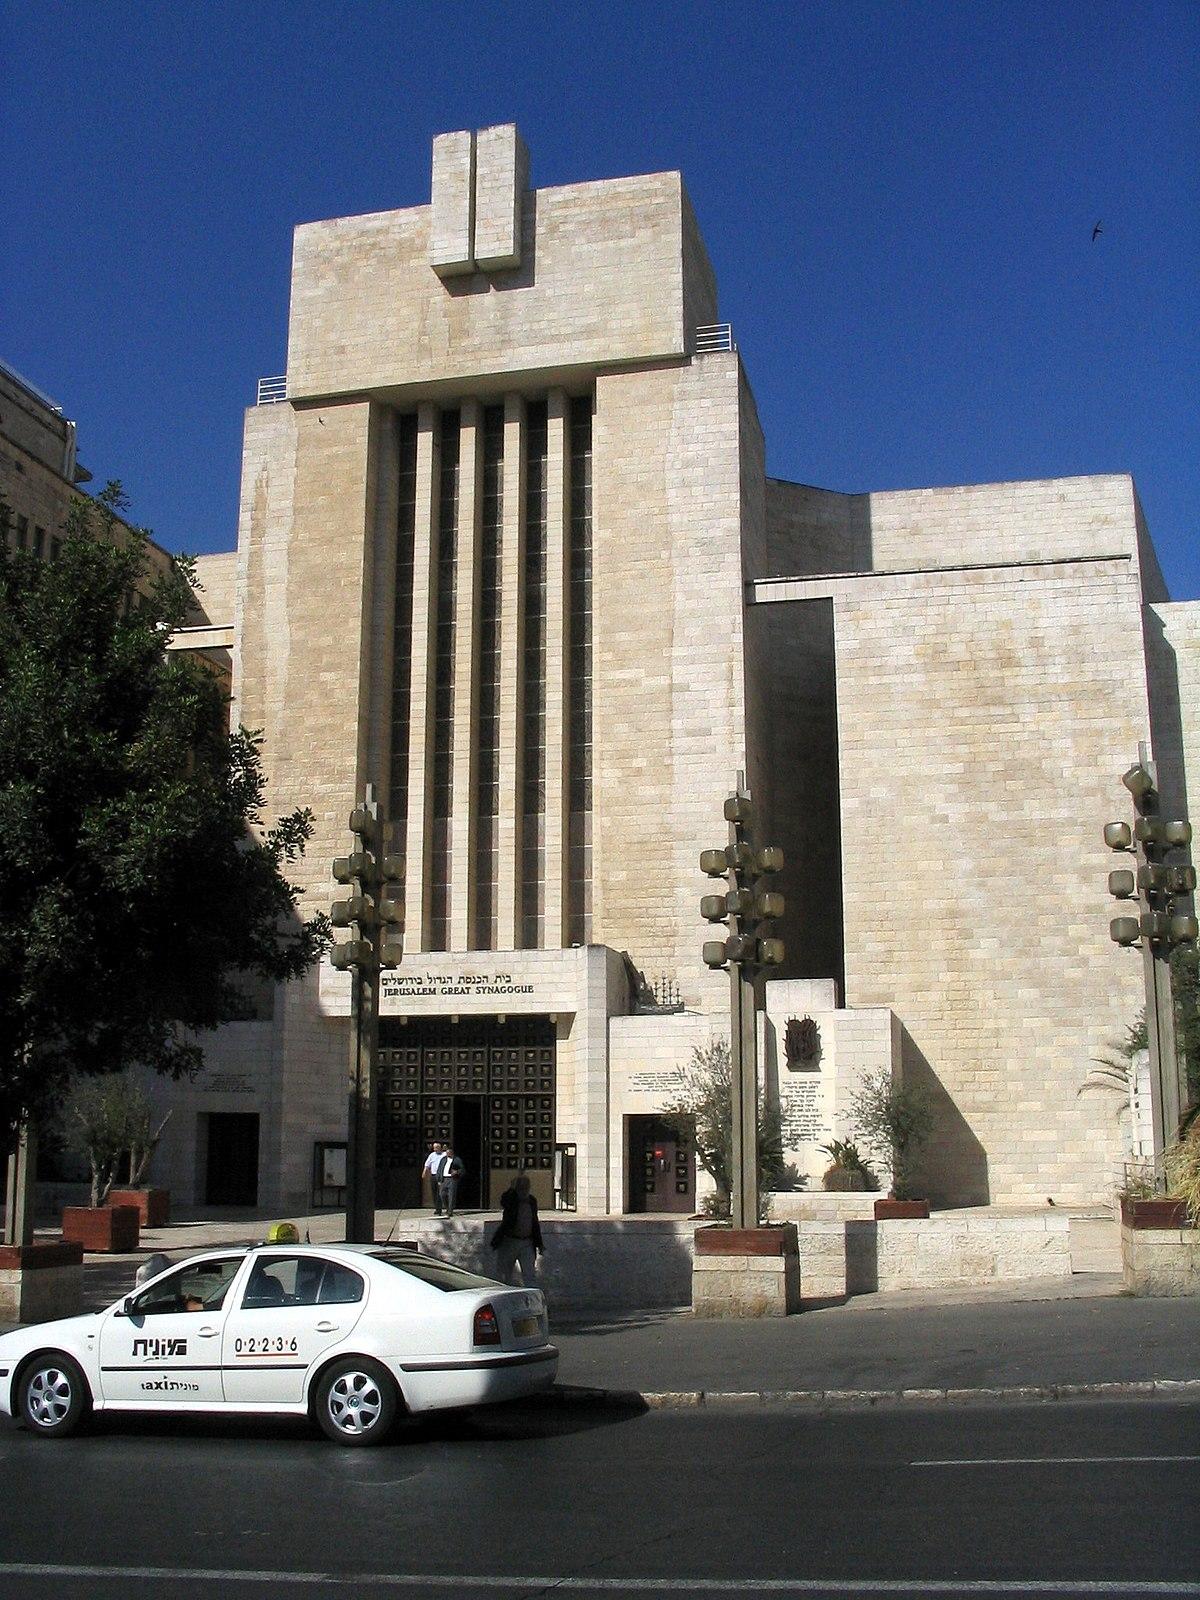 synagogue simple english wikipedia the free encyclopedia